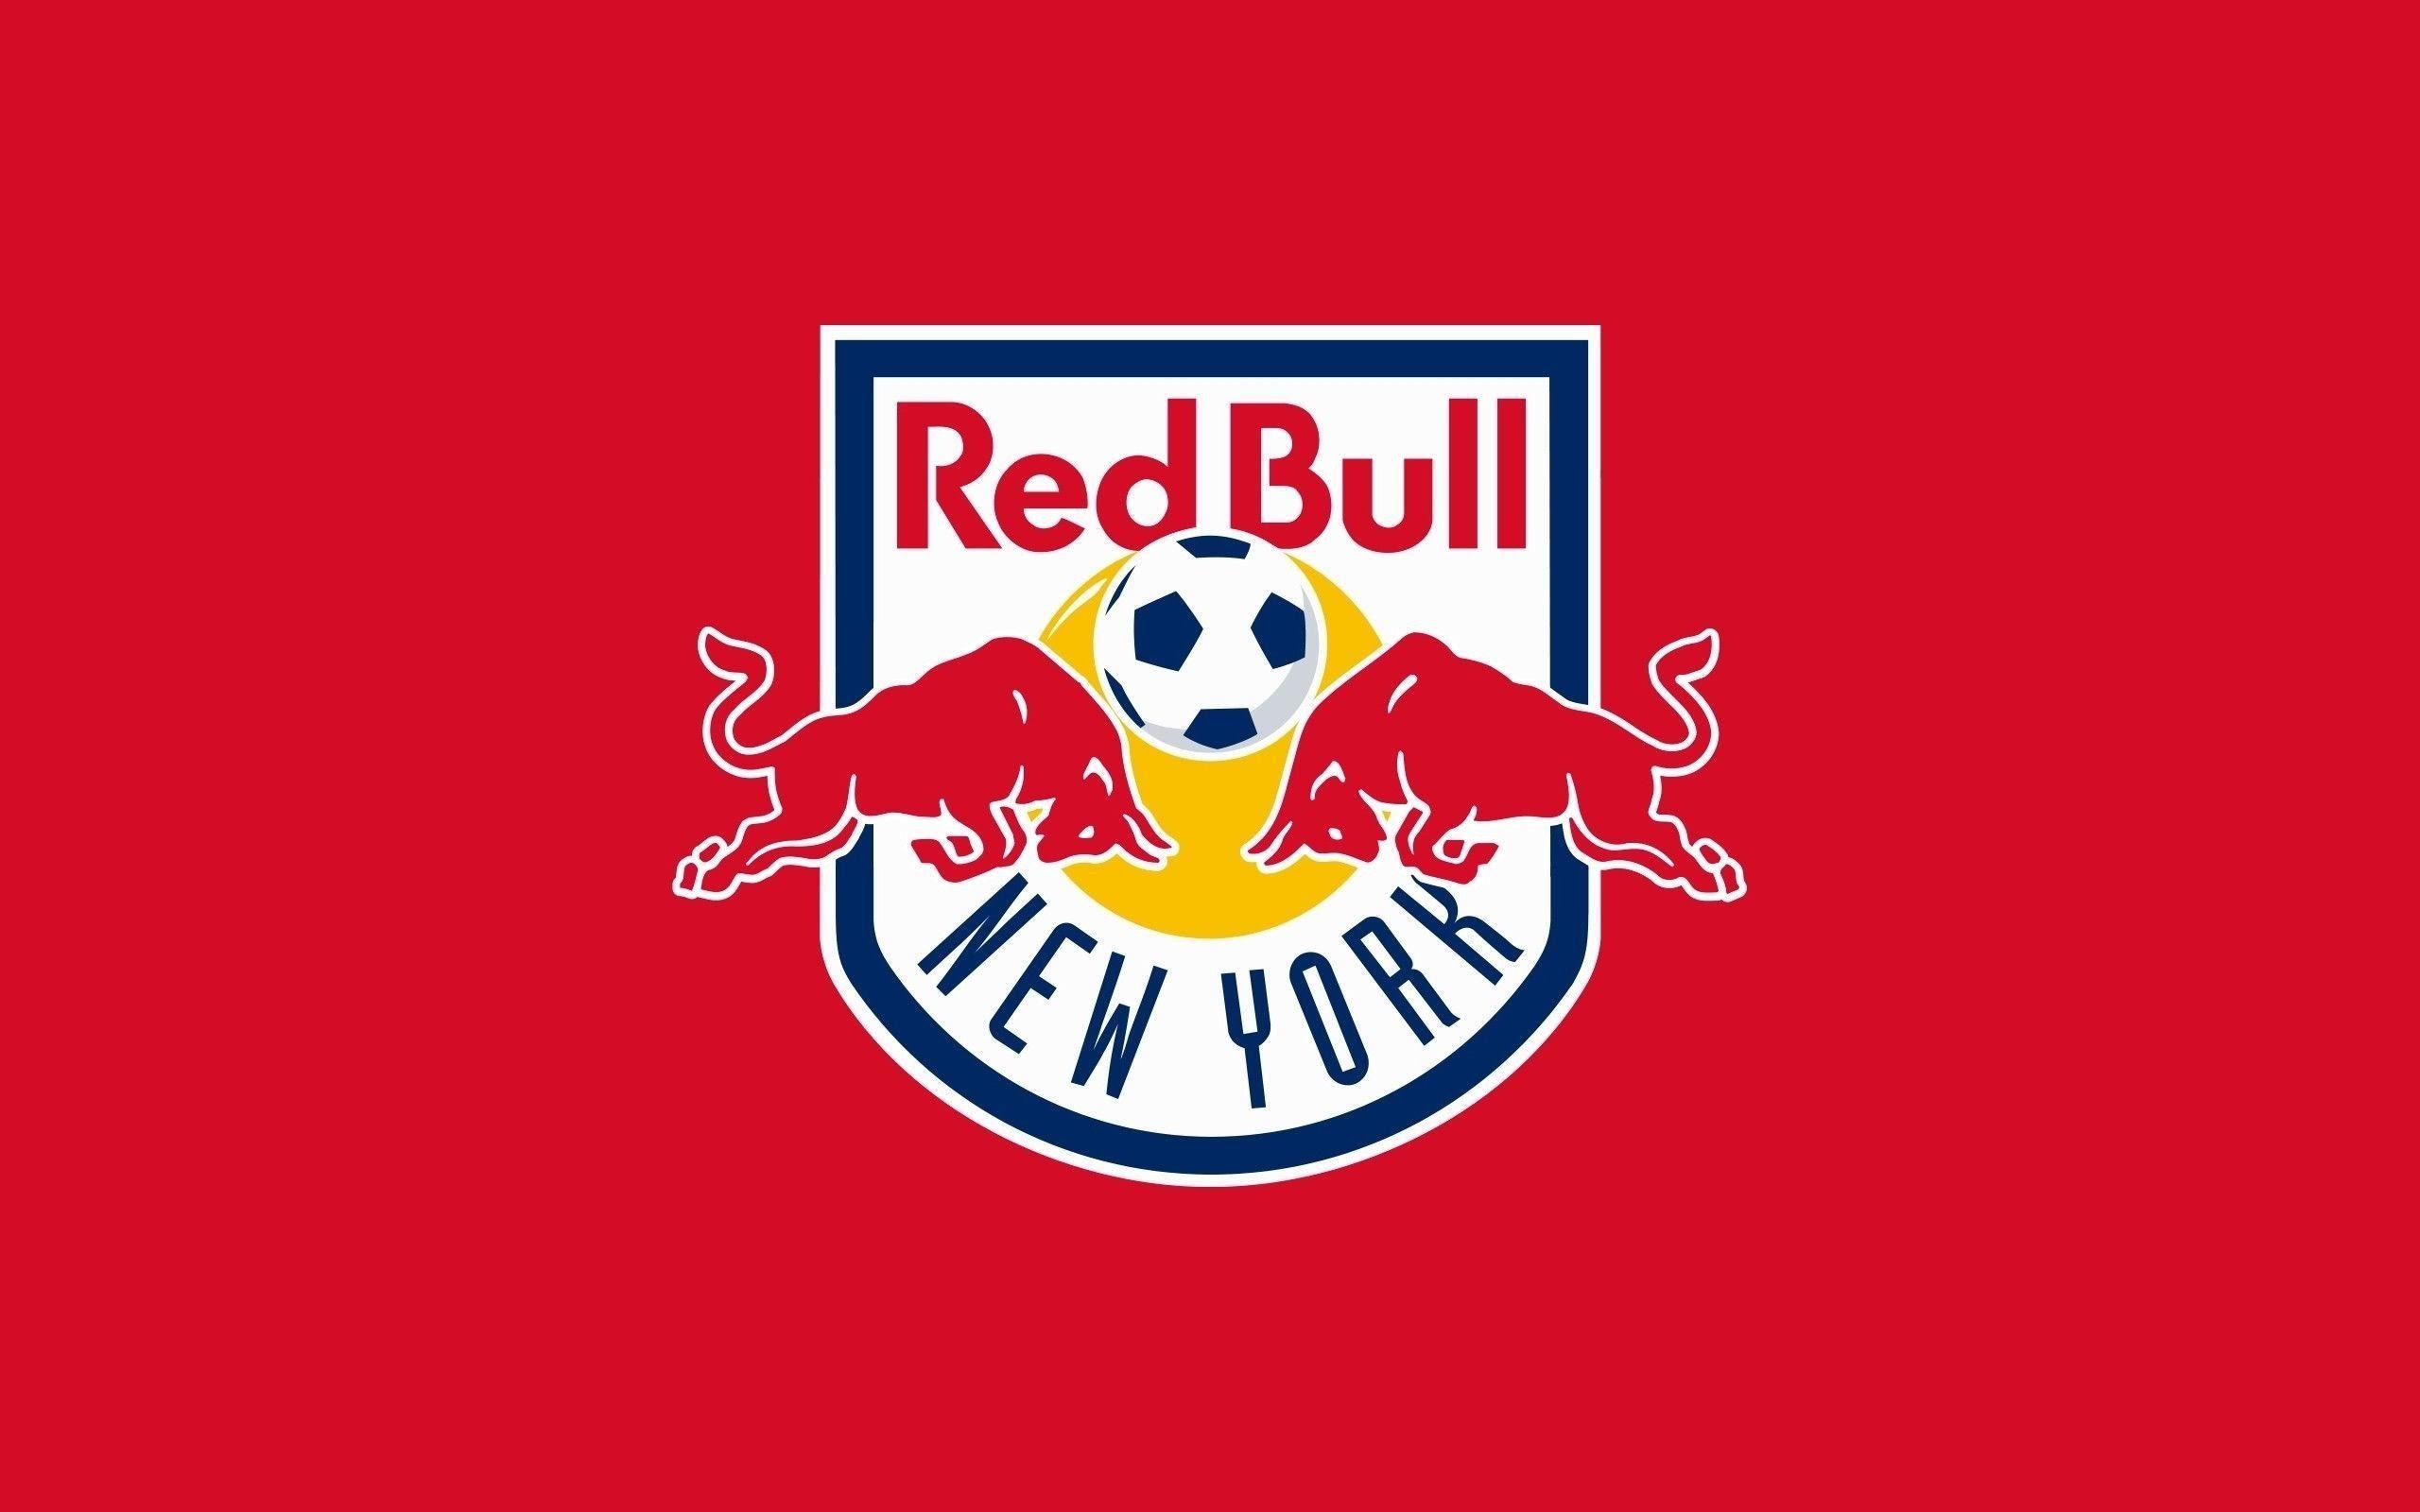 New York Red Bulls Wallpaper 76 Images